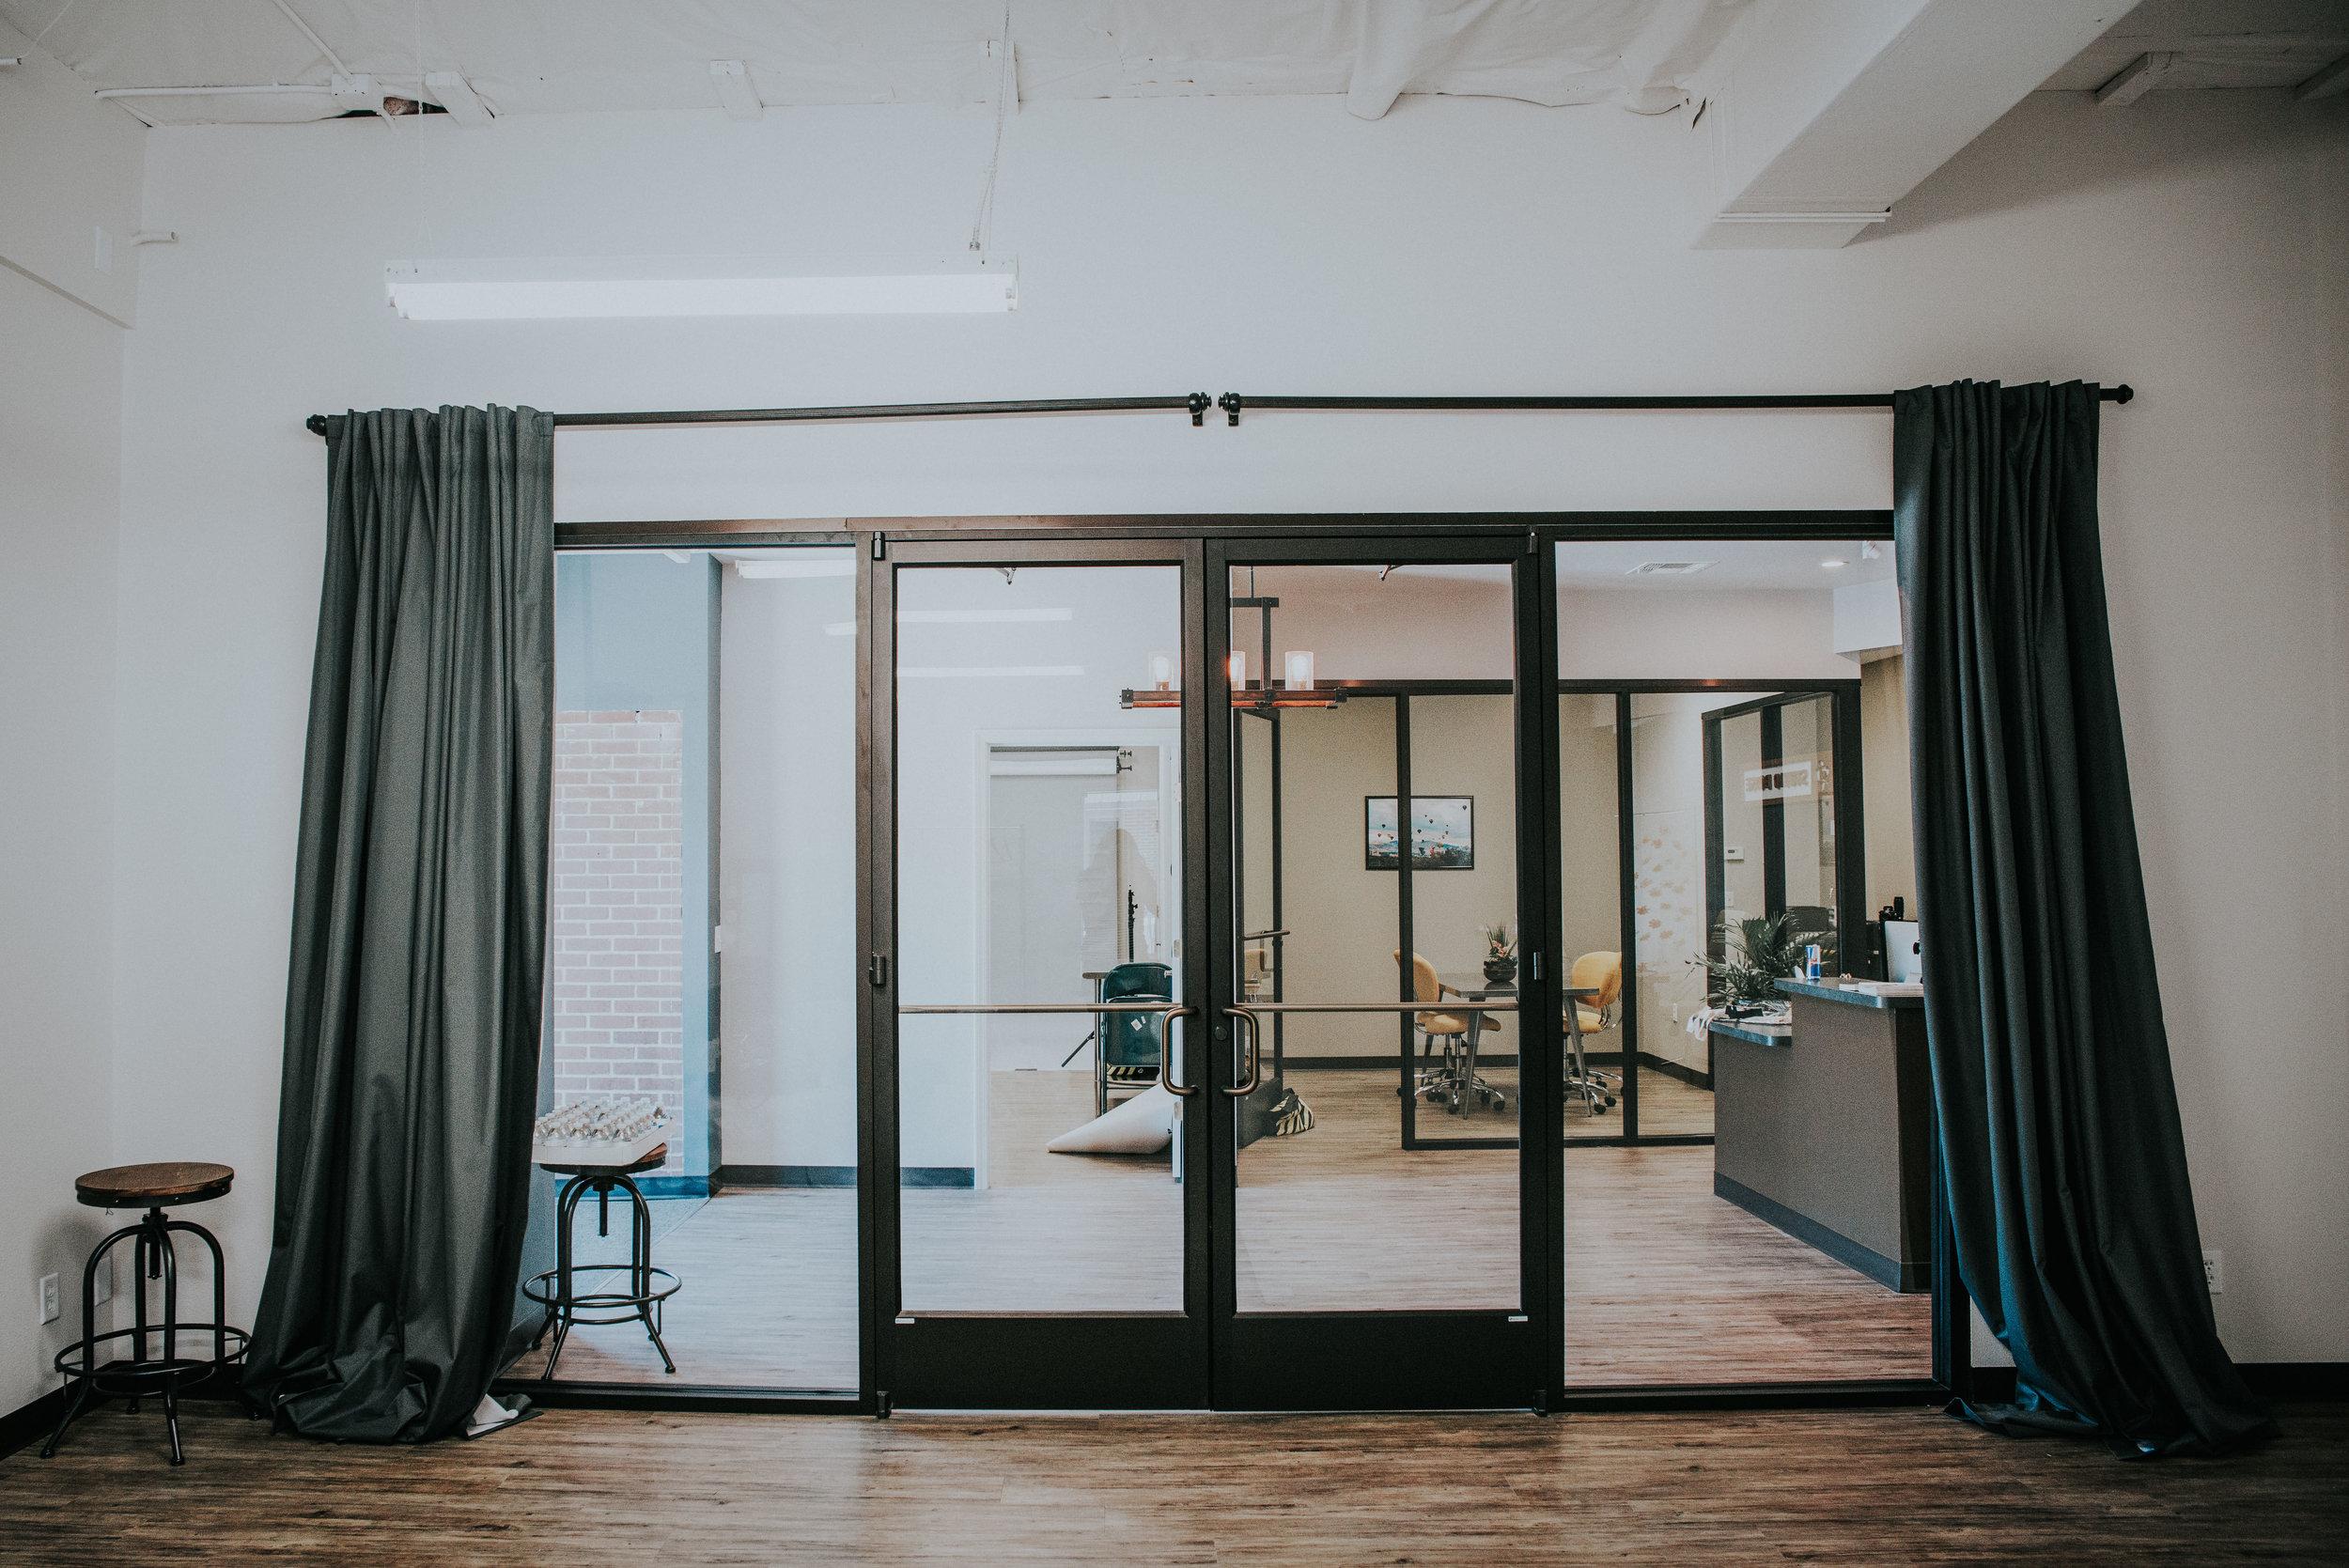 studio boise rental photography idaho-7.jpg